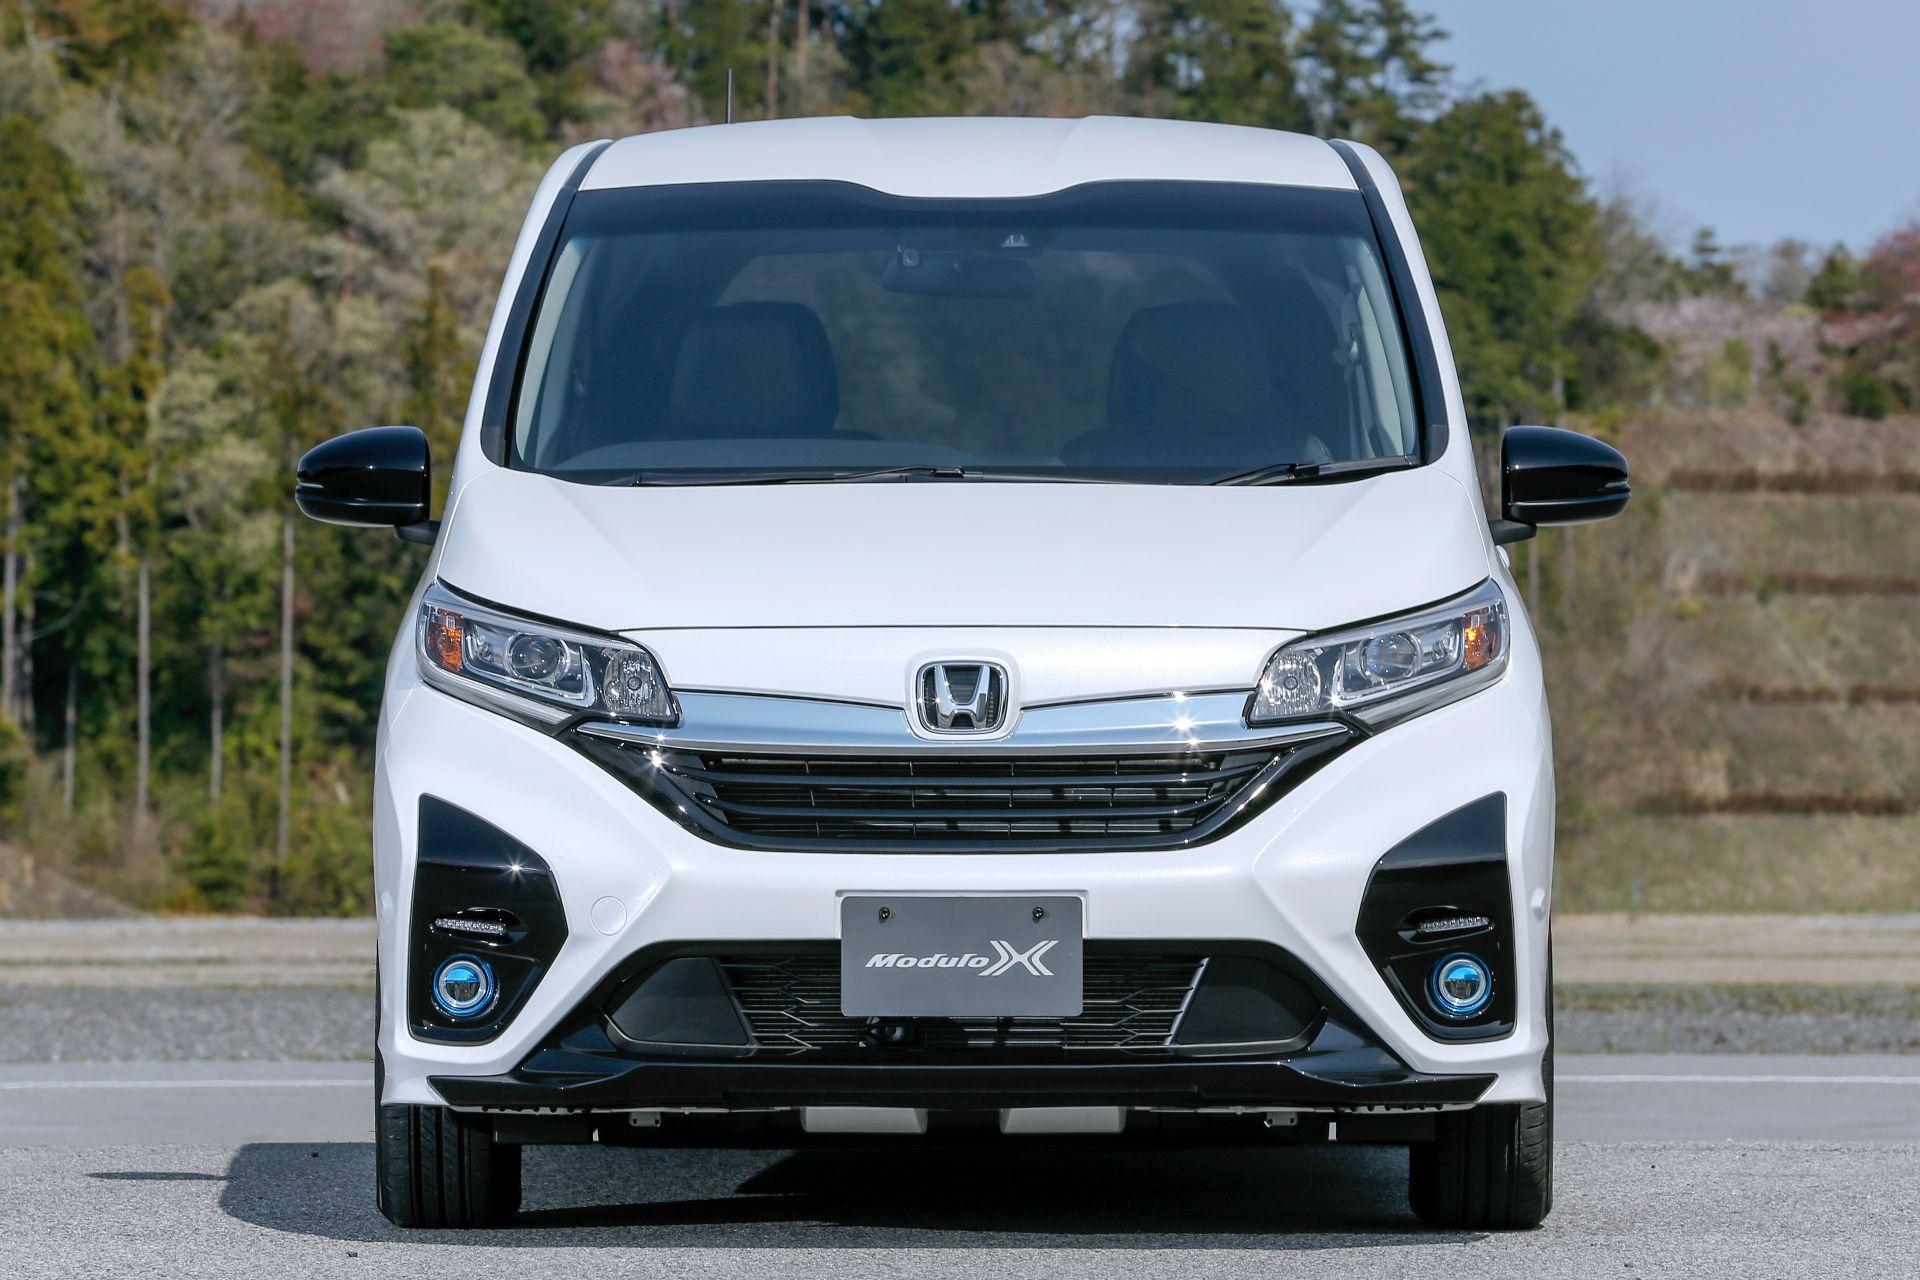 Honda-Freed-Modulo-X-Facelift-2020-26